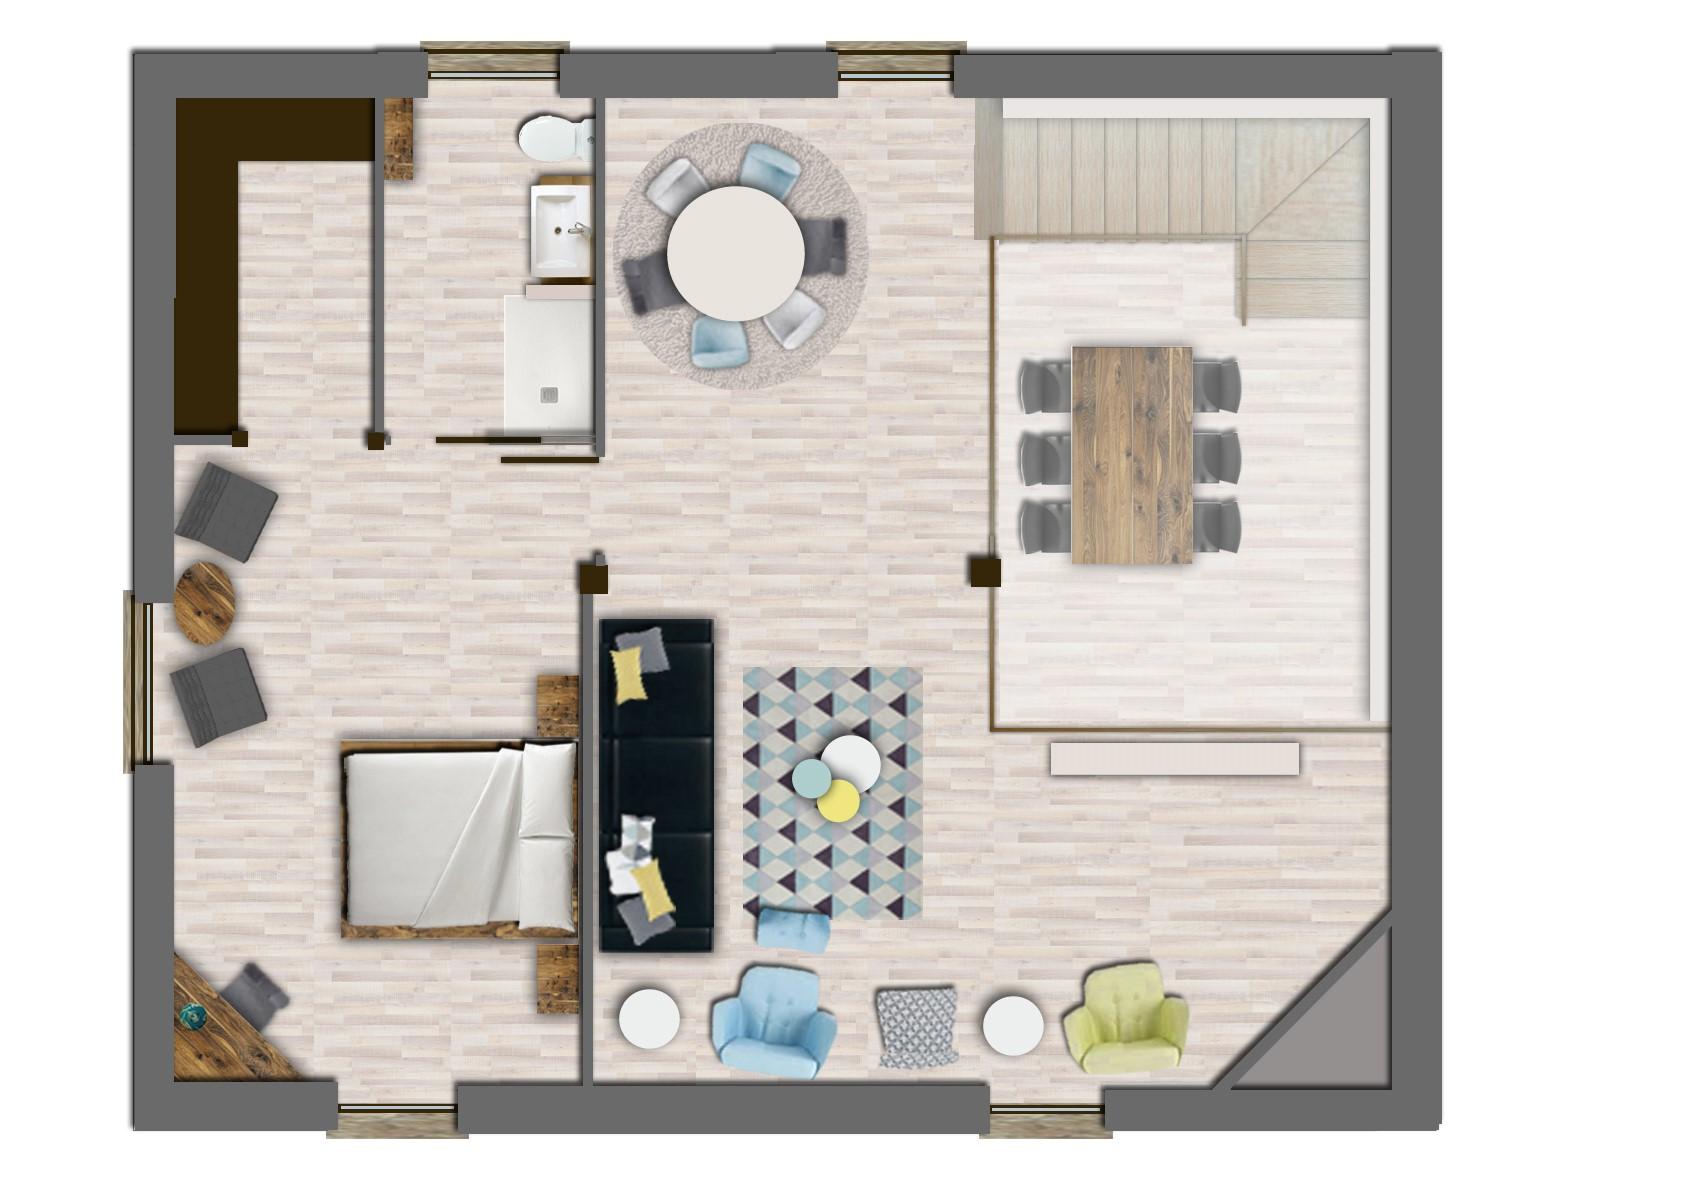 Reforma de baserri ad interior design for Bano bajo escalera planta